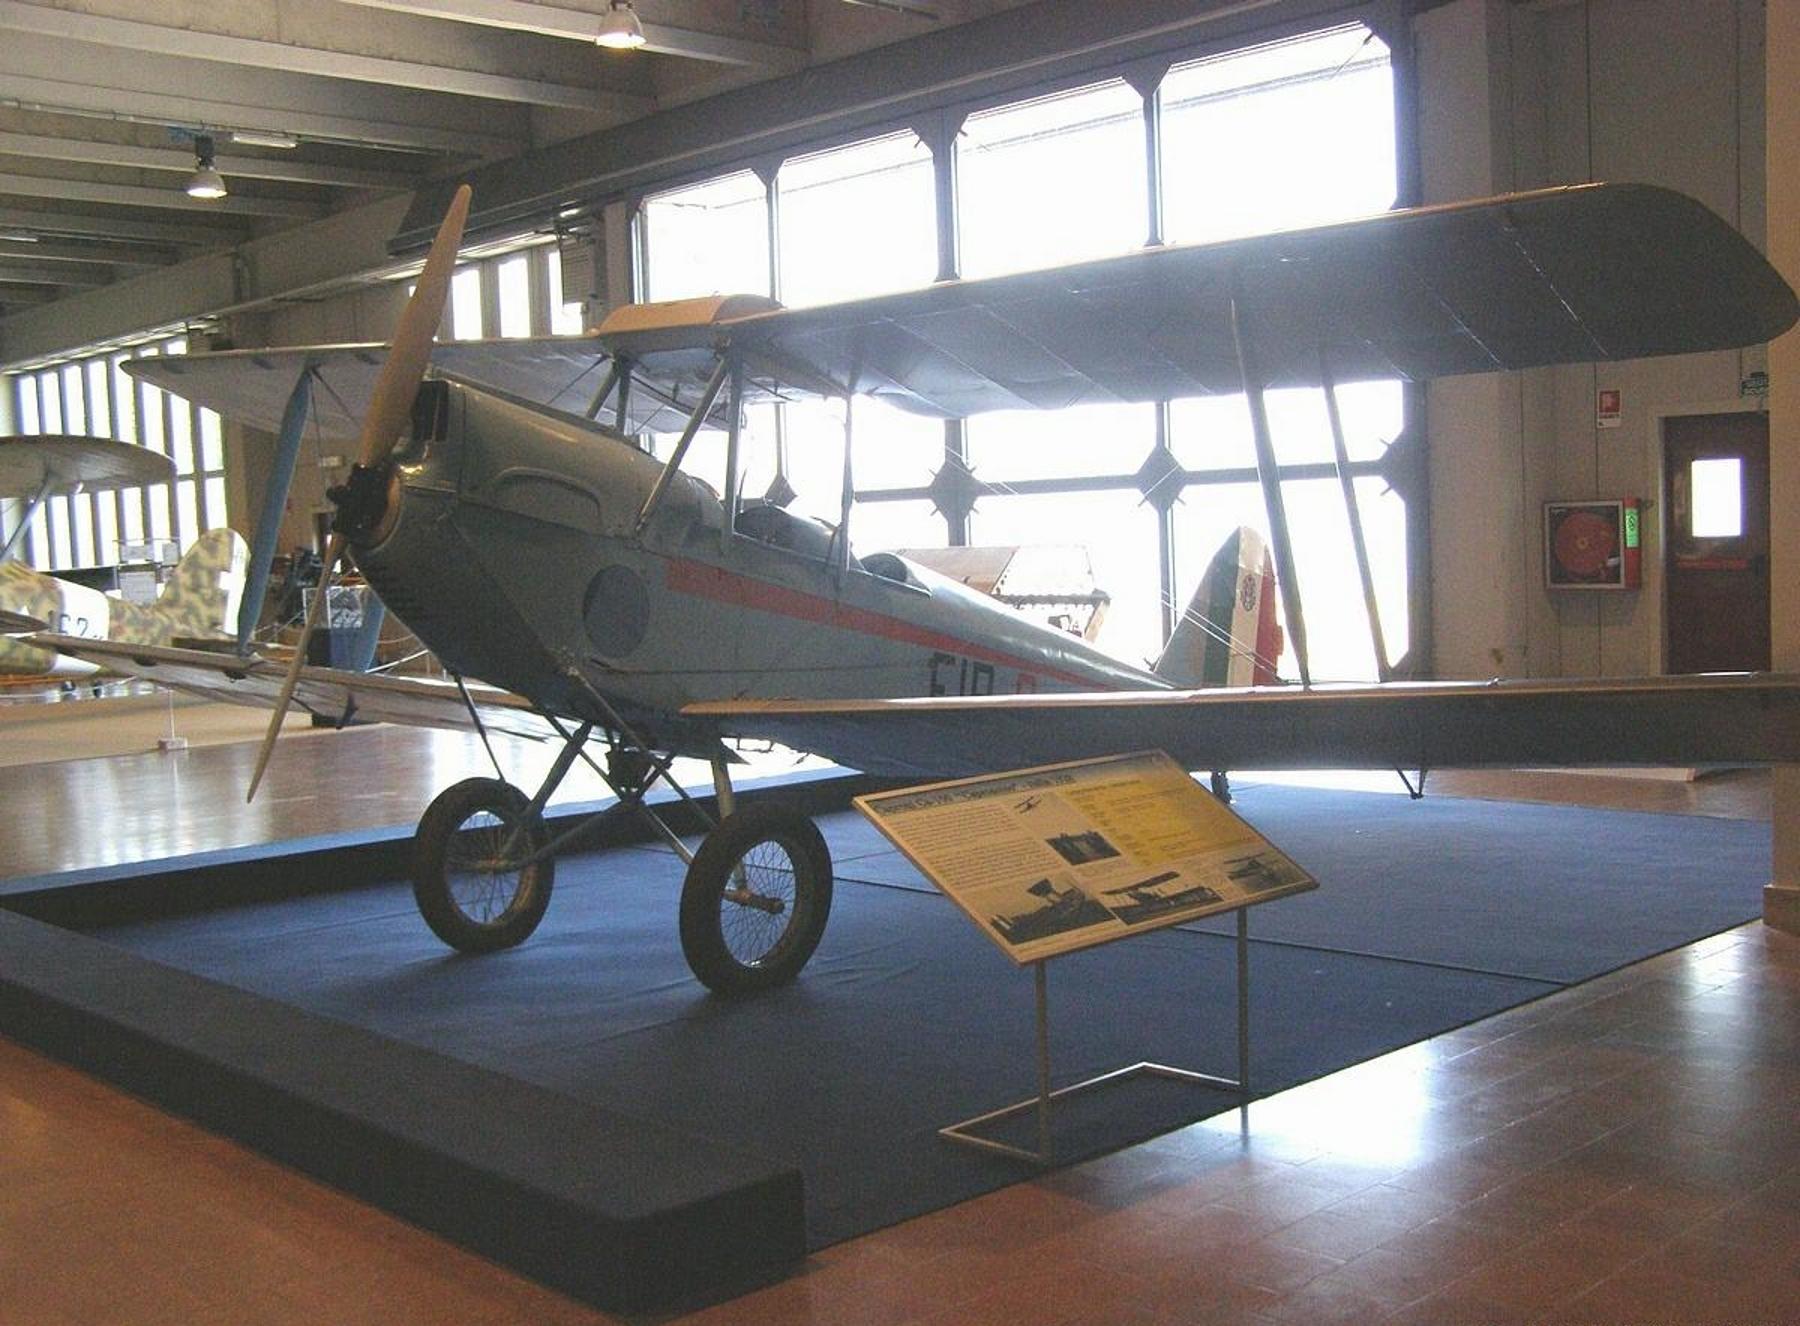 Caproni Ca.100